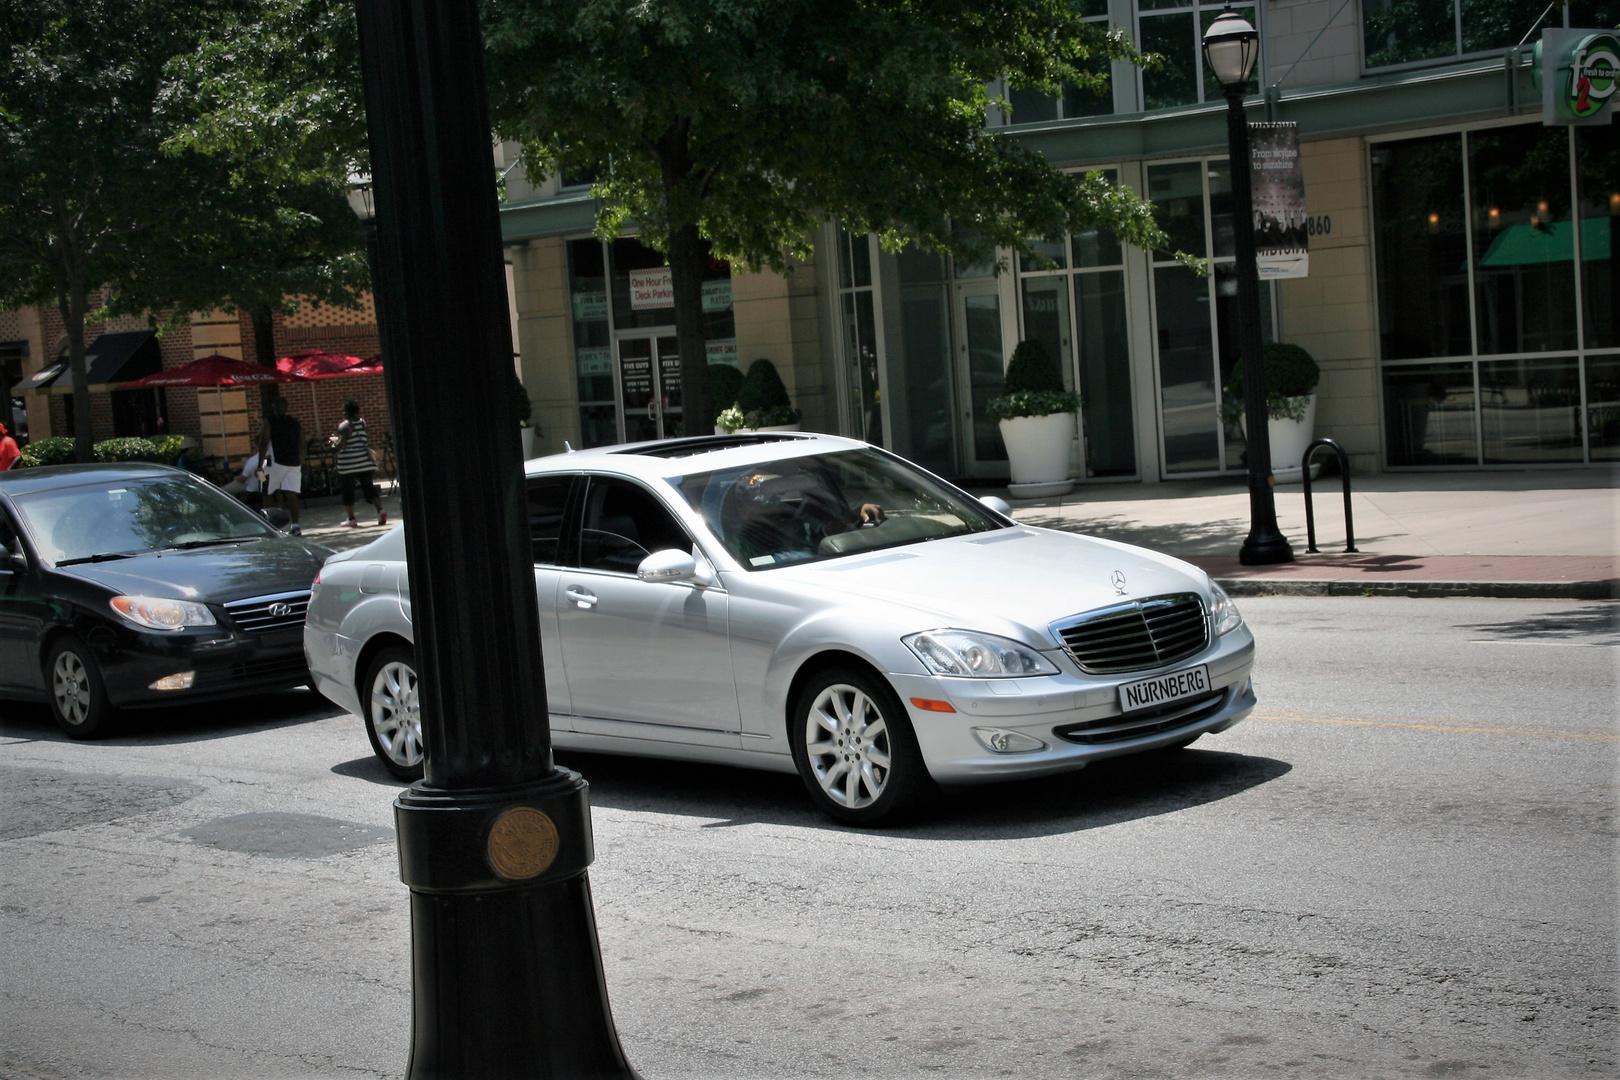 Ups, ein Nürnberger in Atlanta ;-)